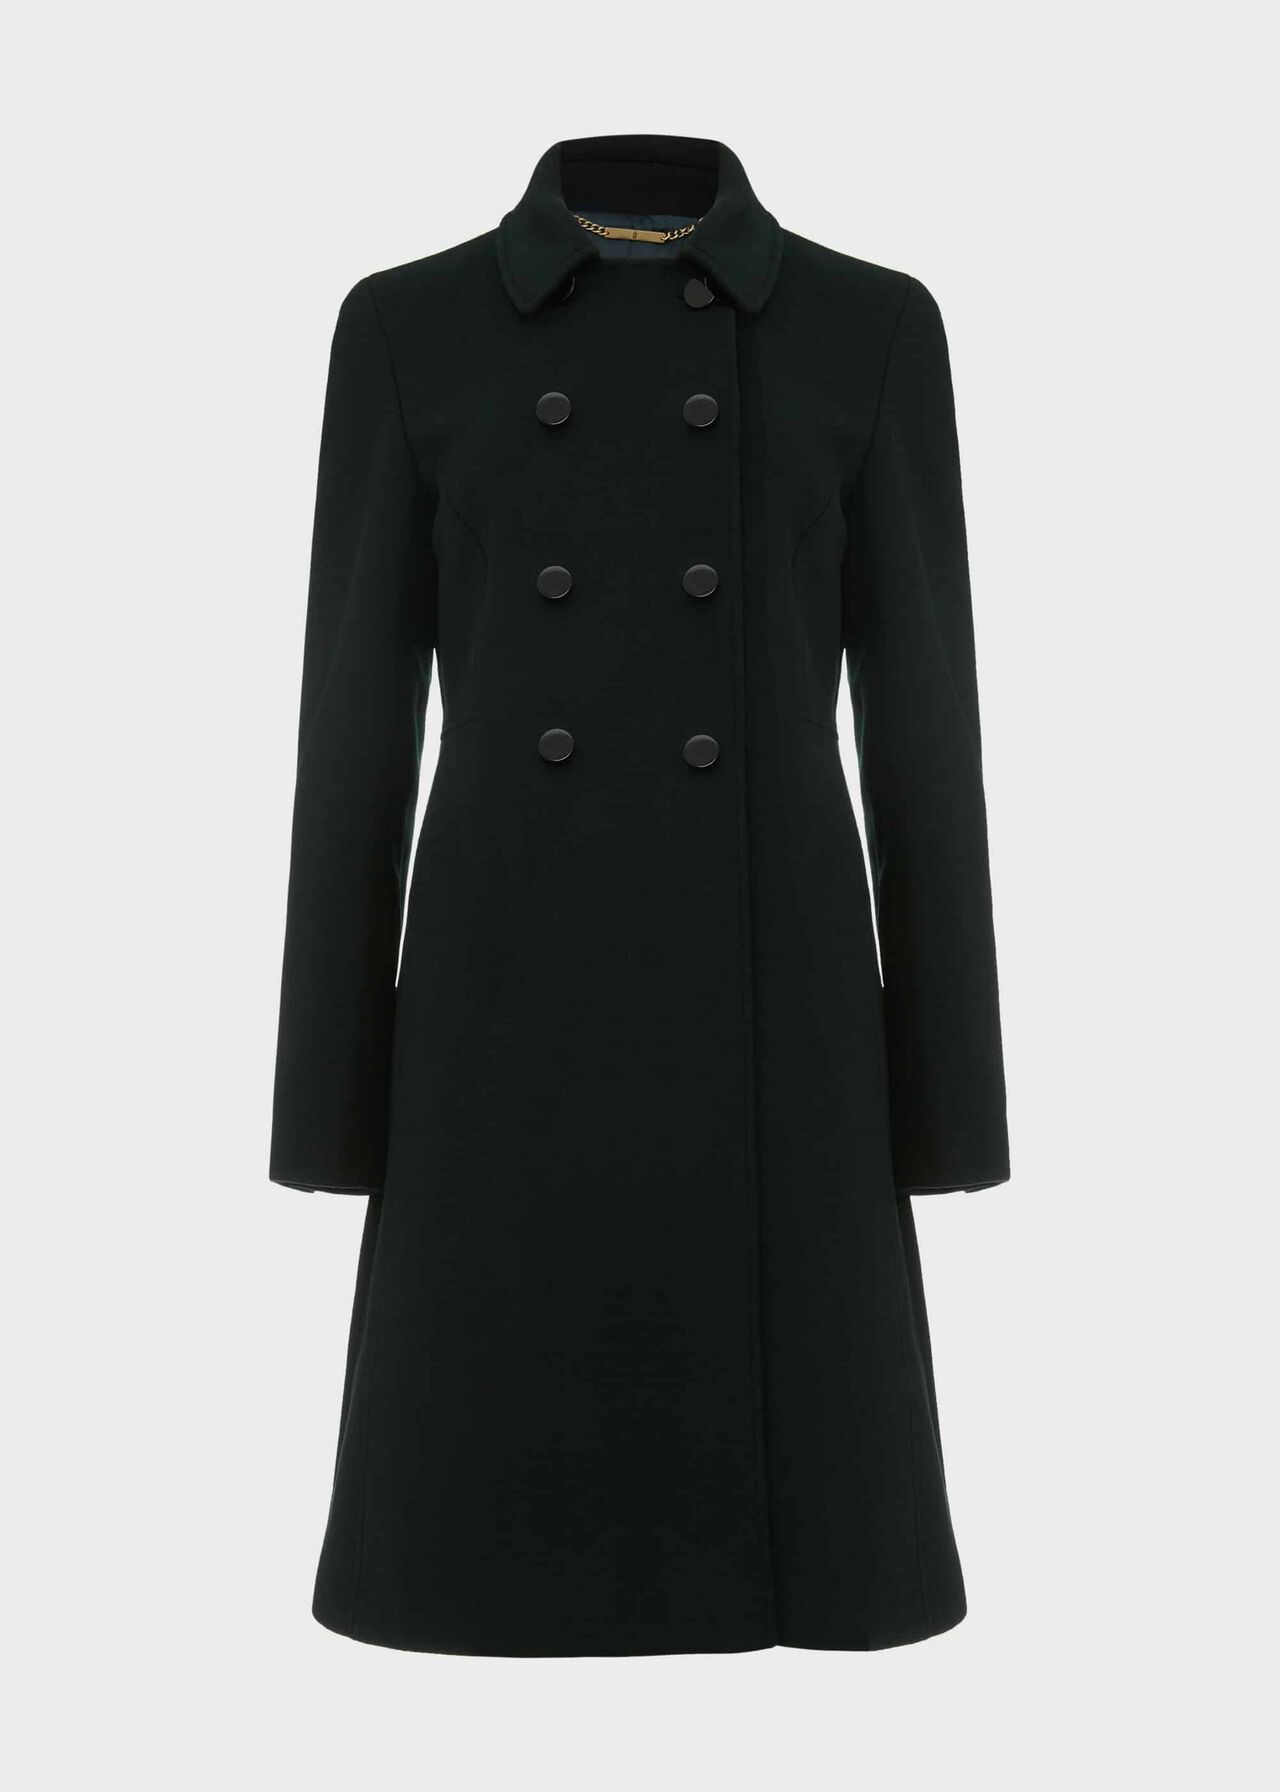 Petite Sylvia Wool Blend Coat Fern Green